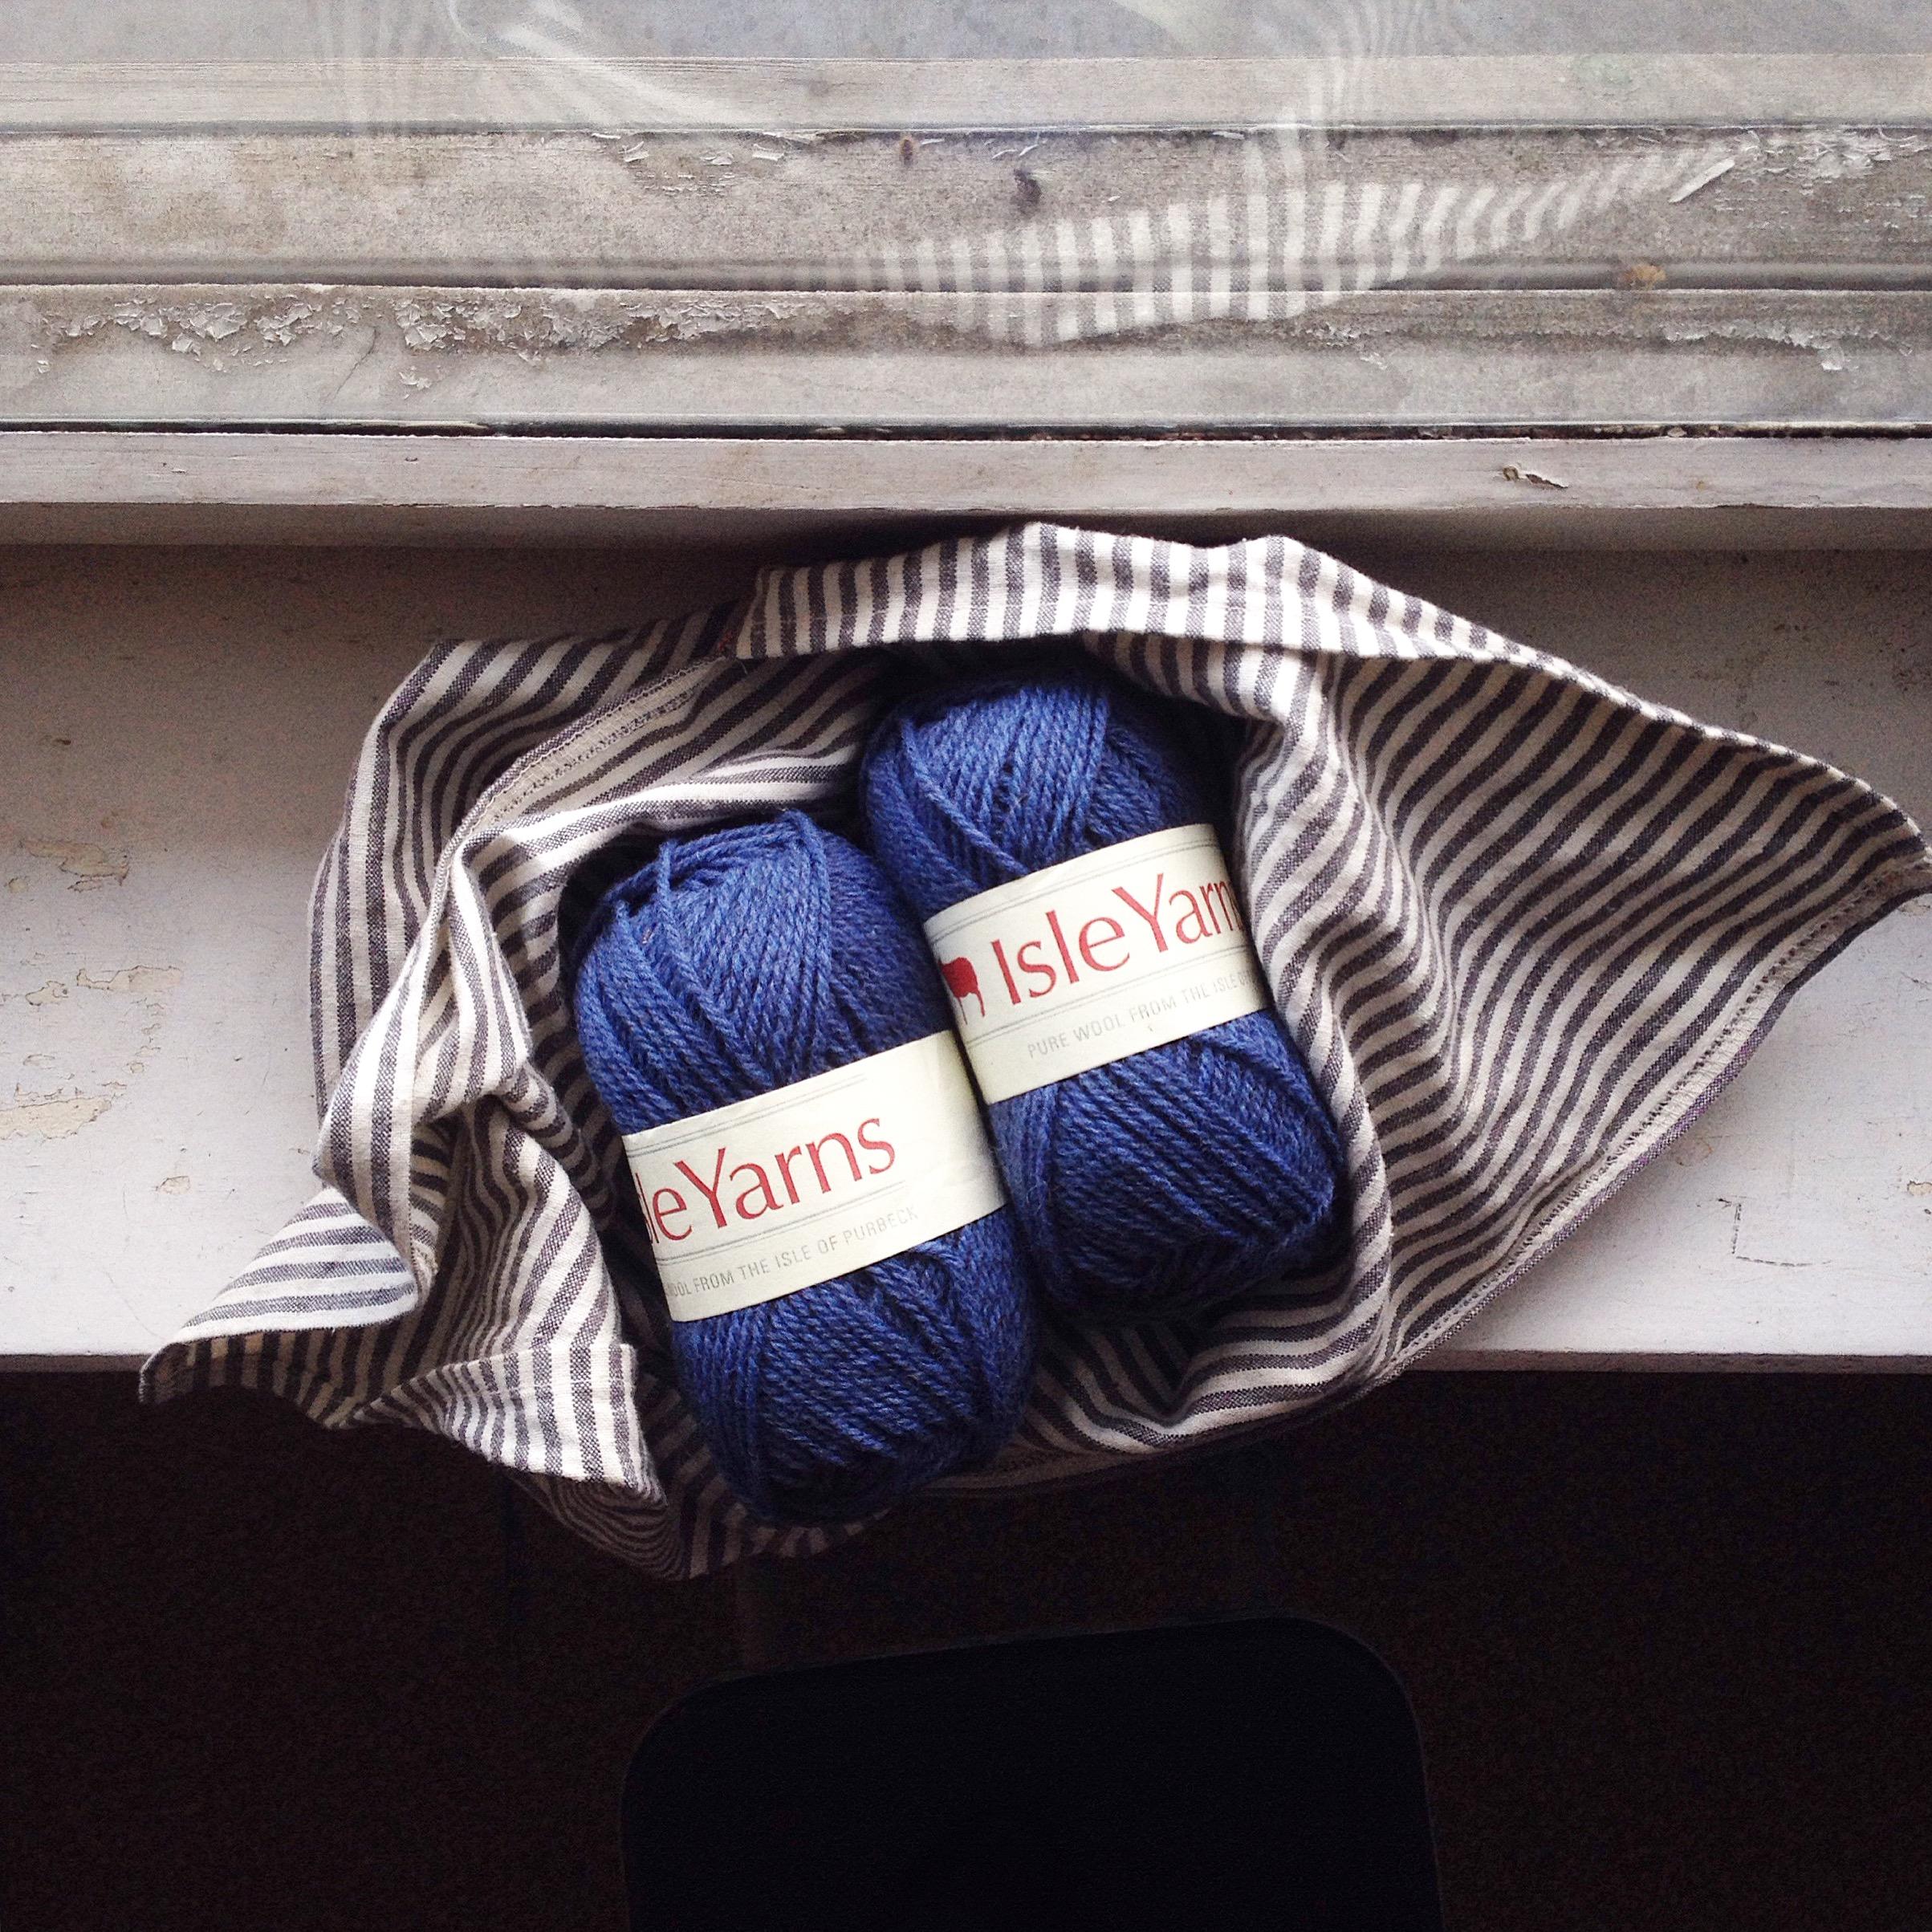 Mandarine's: Isle yarn review & giveaway